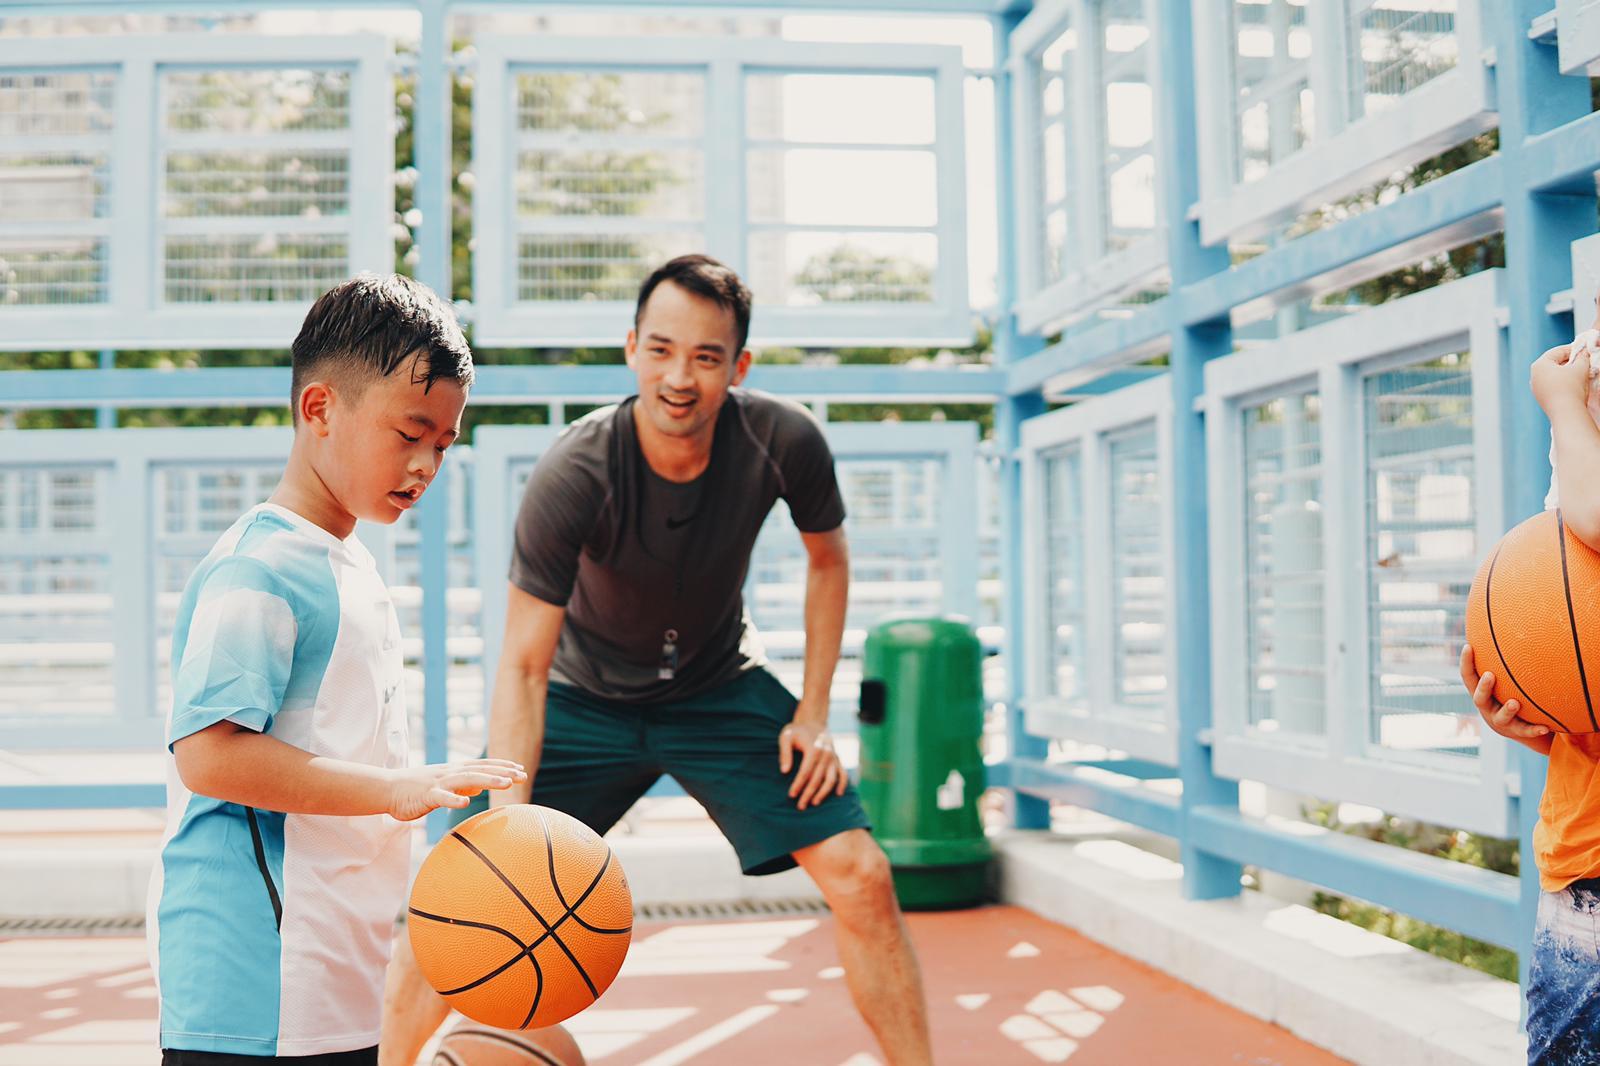 ELV -  Basketball Fundamentals & HIIT Fitness